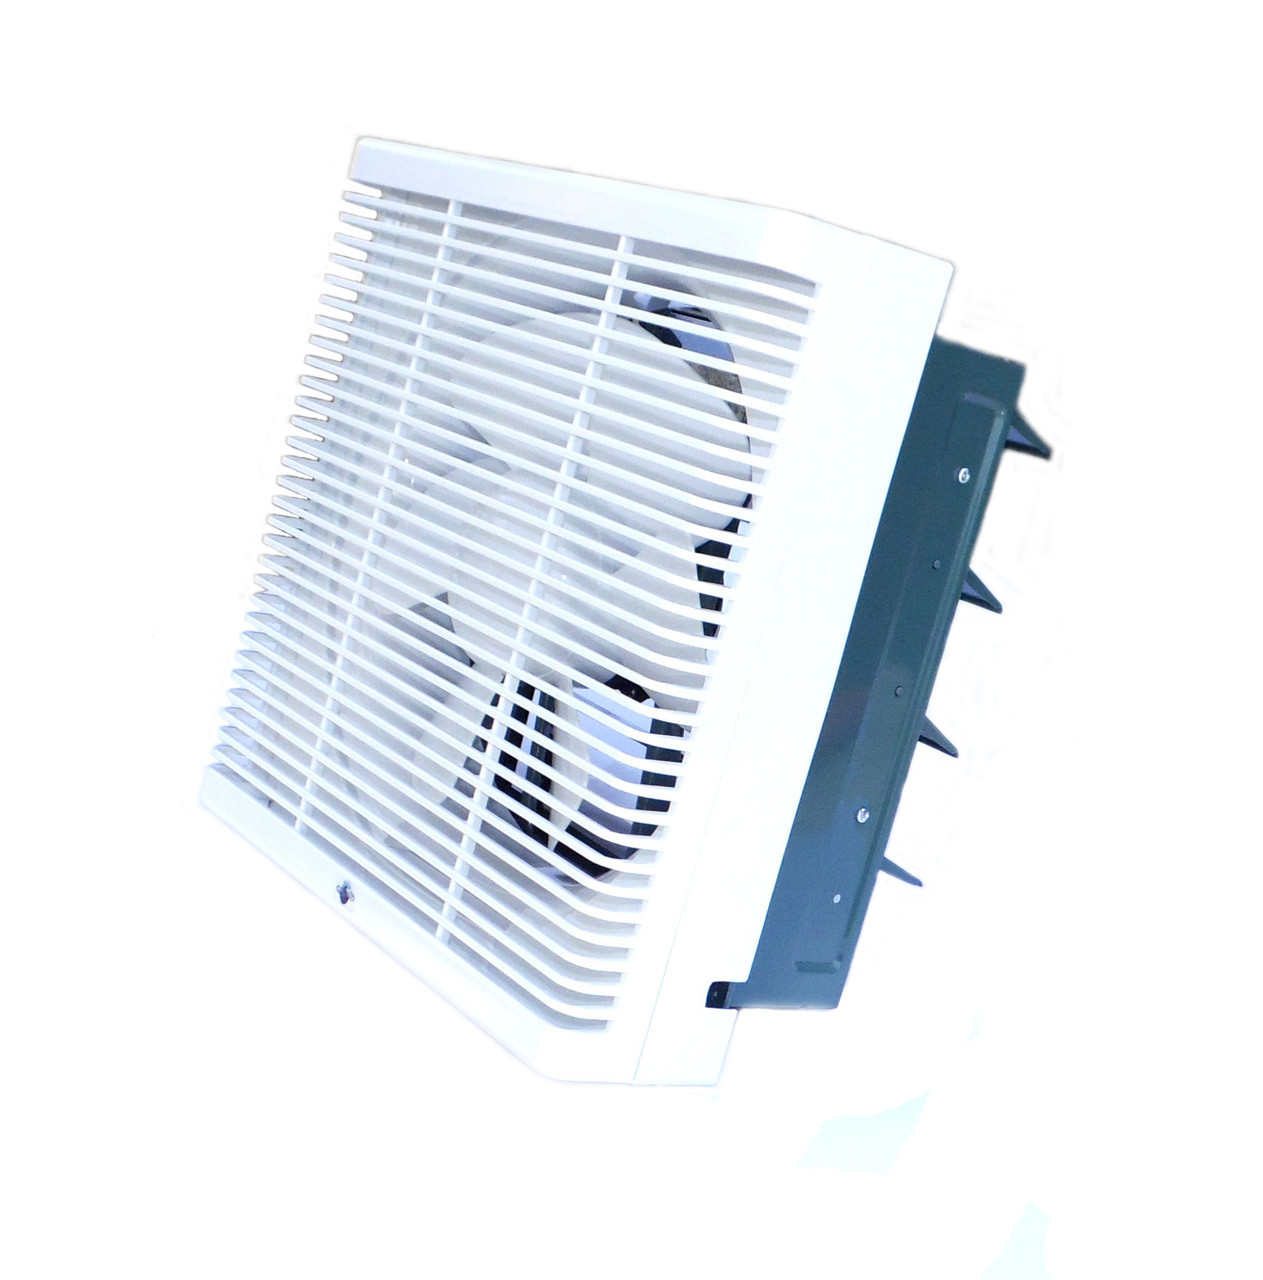 Осьовий реверсивний віконний (форточный) вентилятор Турбовент ОВР 250